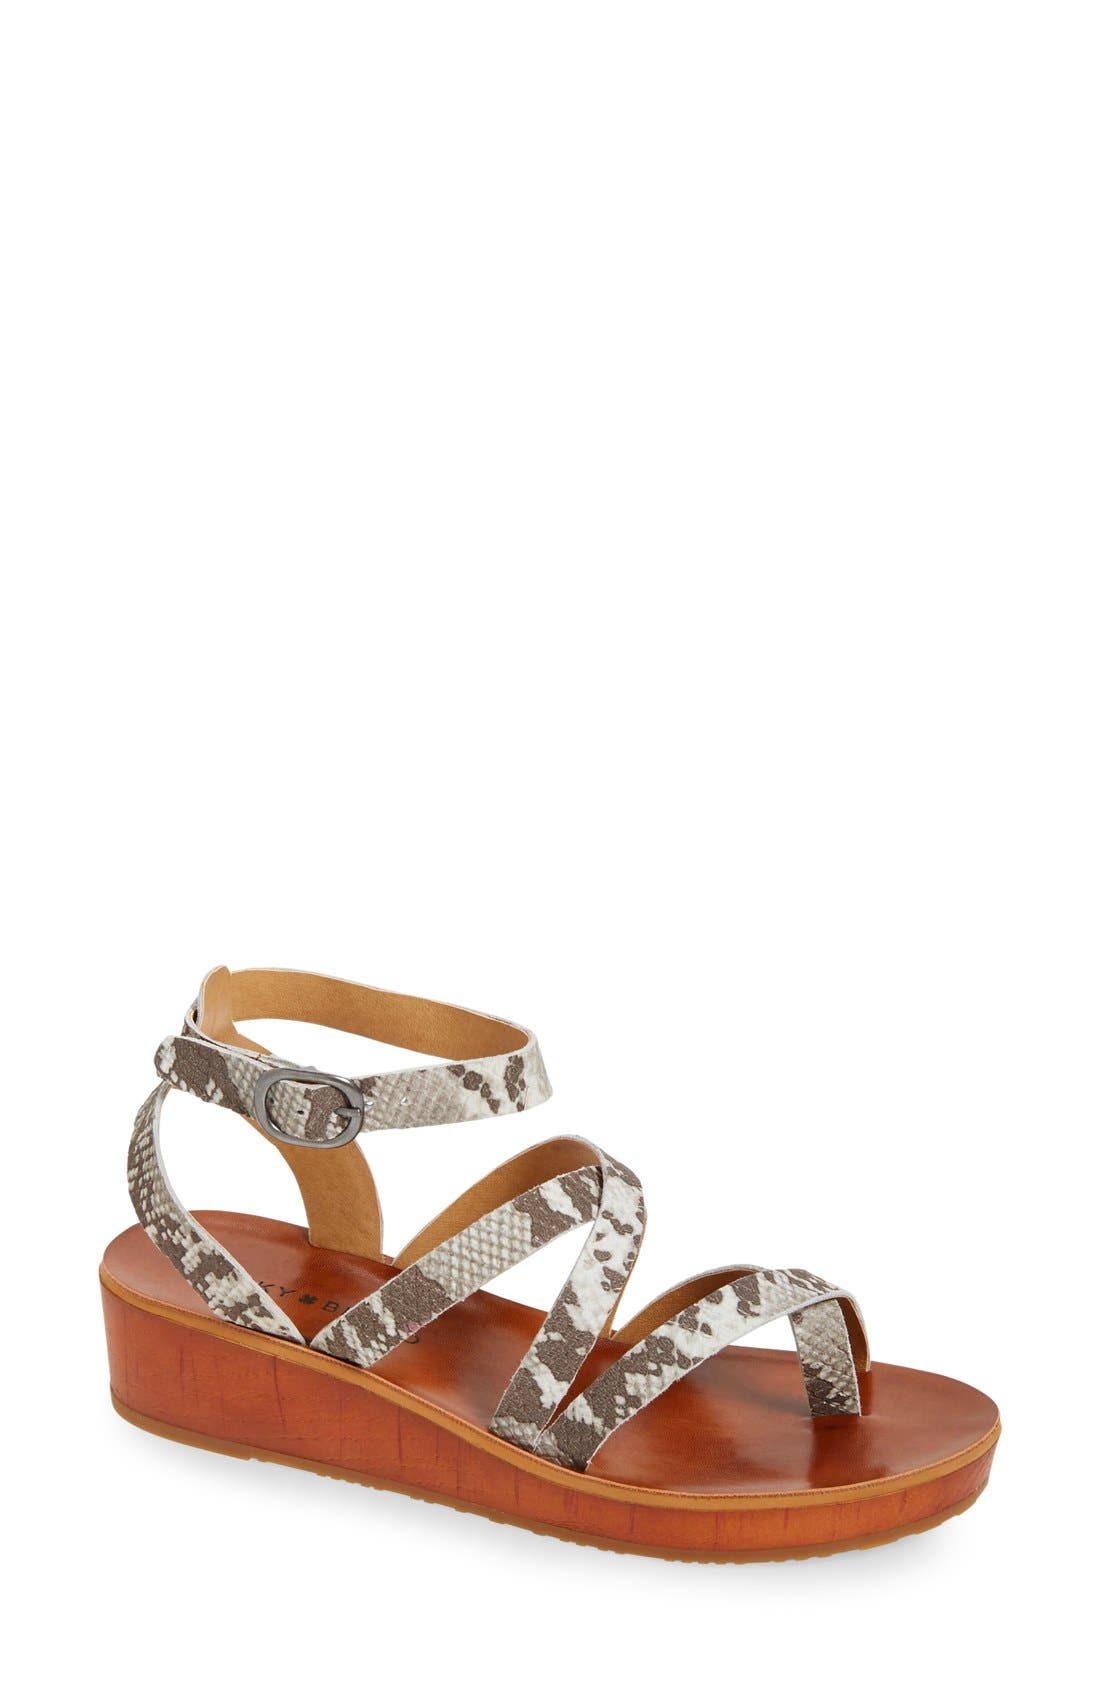 Main Image - Lucky Brand 'Honeyy' Platform Sandal (Women)